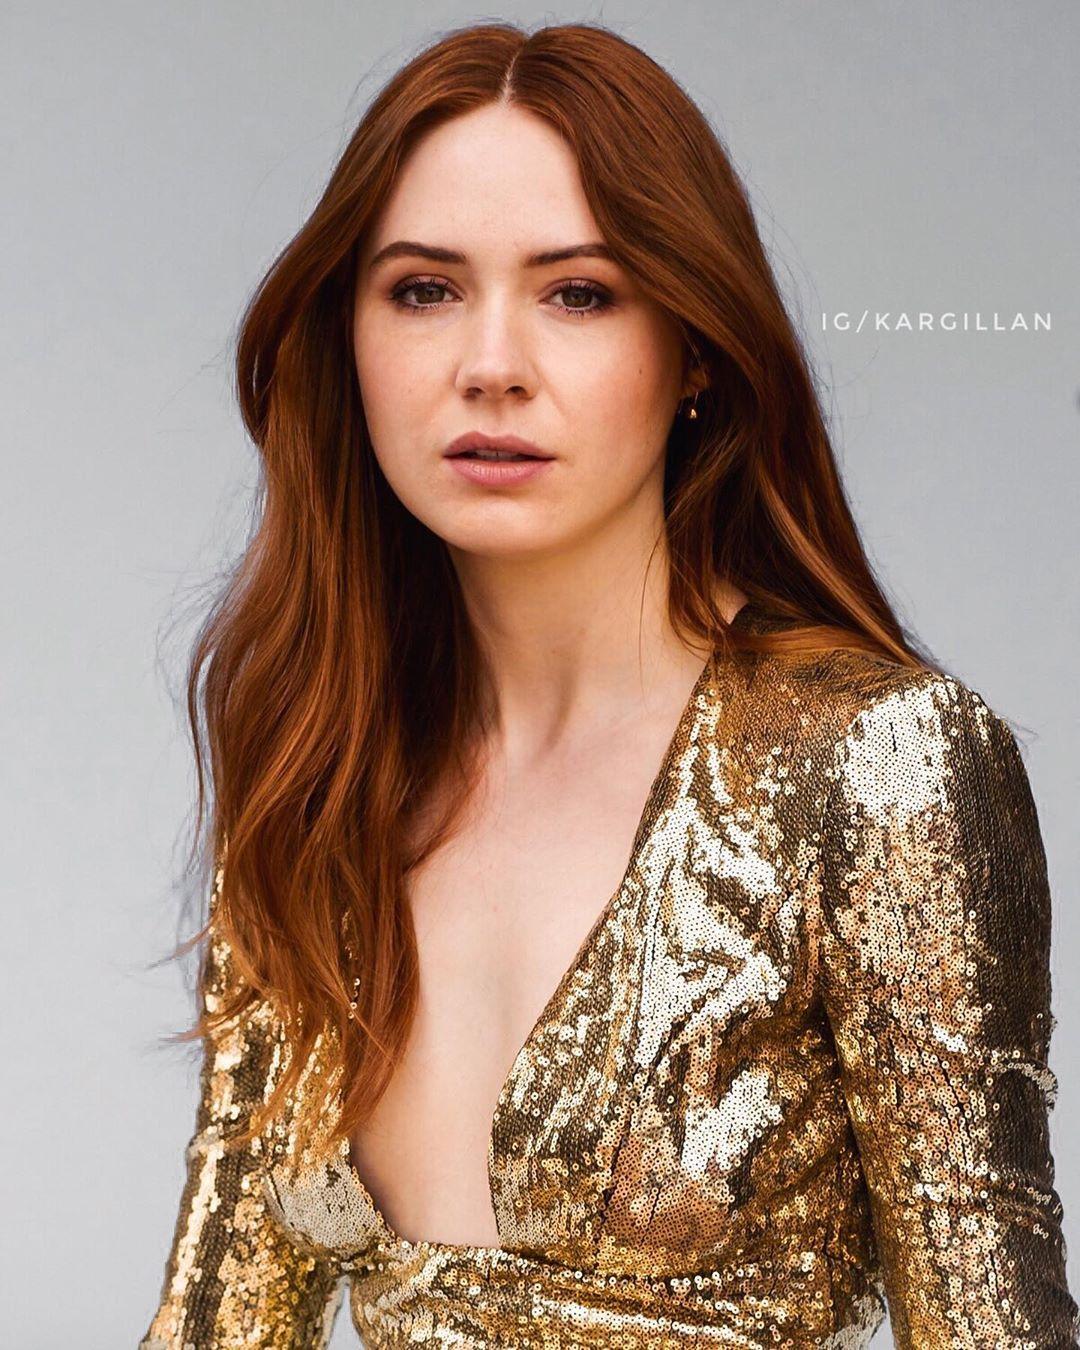 Karen Gillan Nebula Amy Pond On Instagram Karen